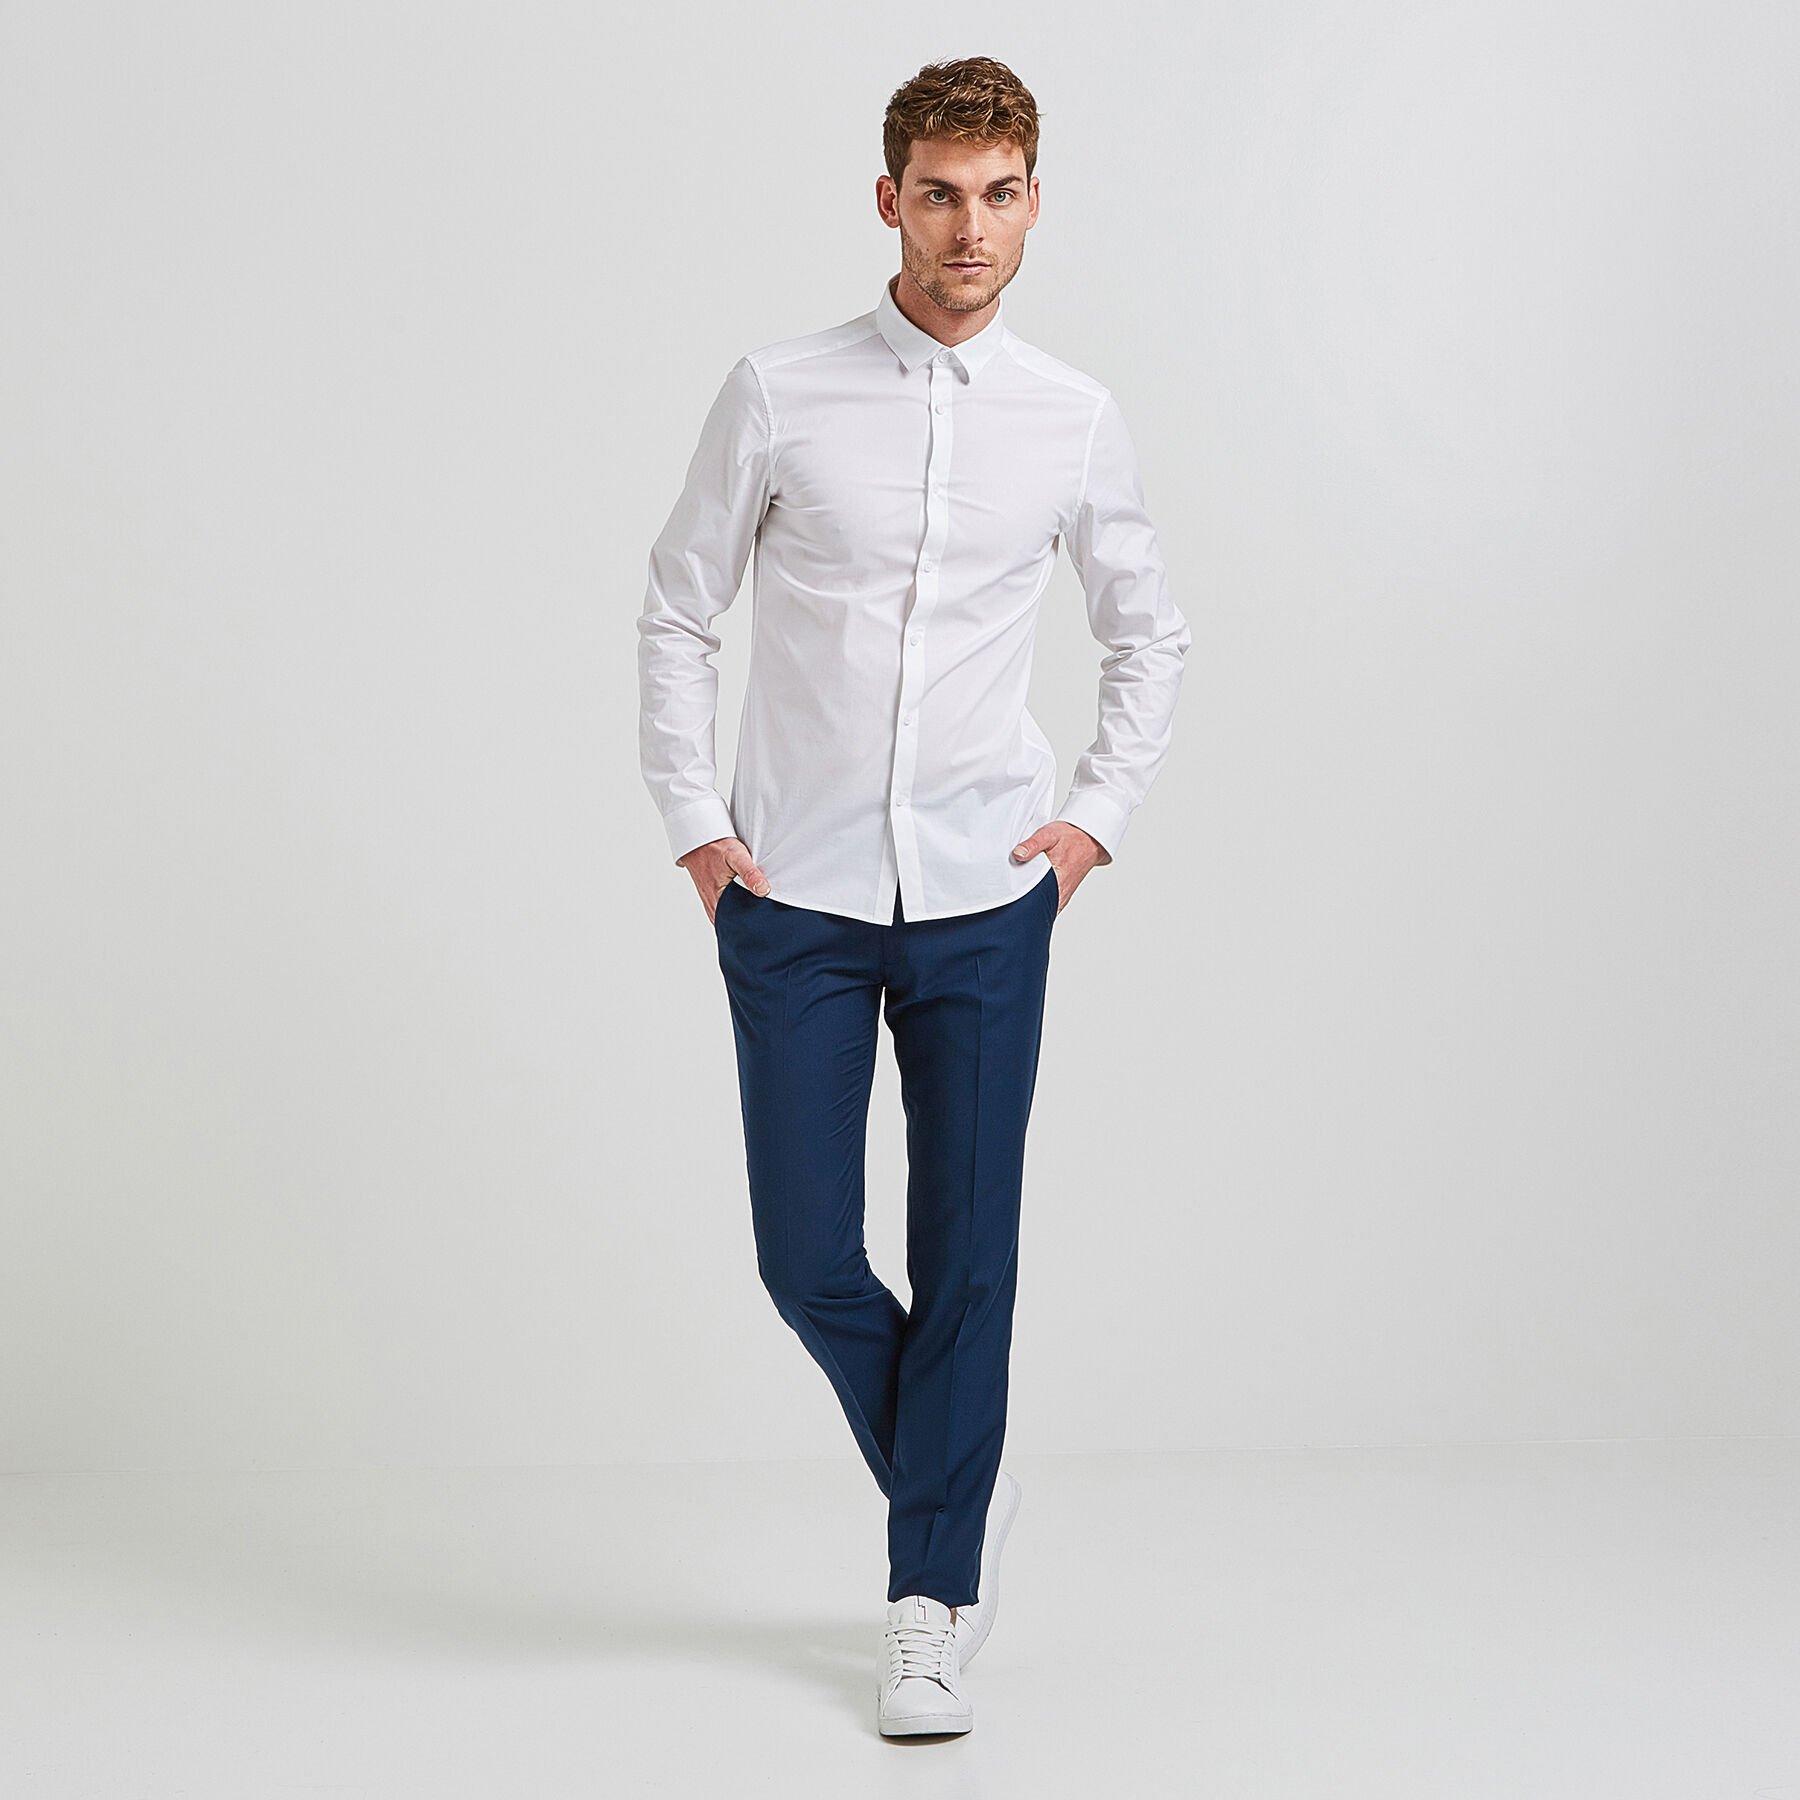 pantalon de costume slim bleu canard homme jules. Black Bedroom Furniture Sets. Home Design Ideas